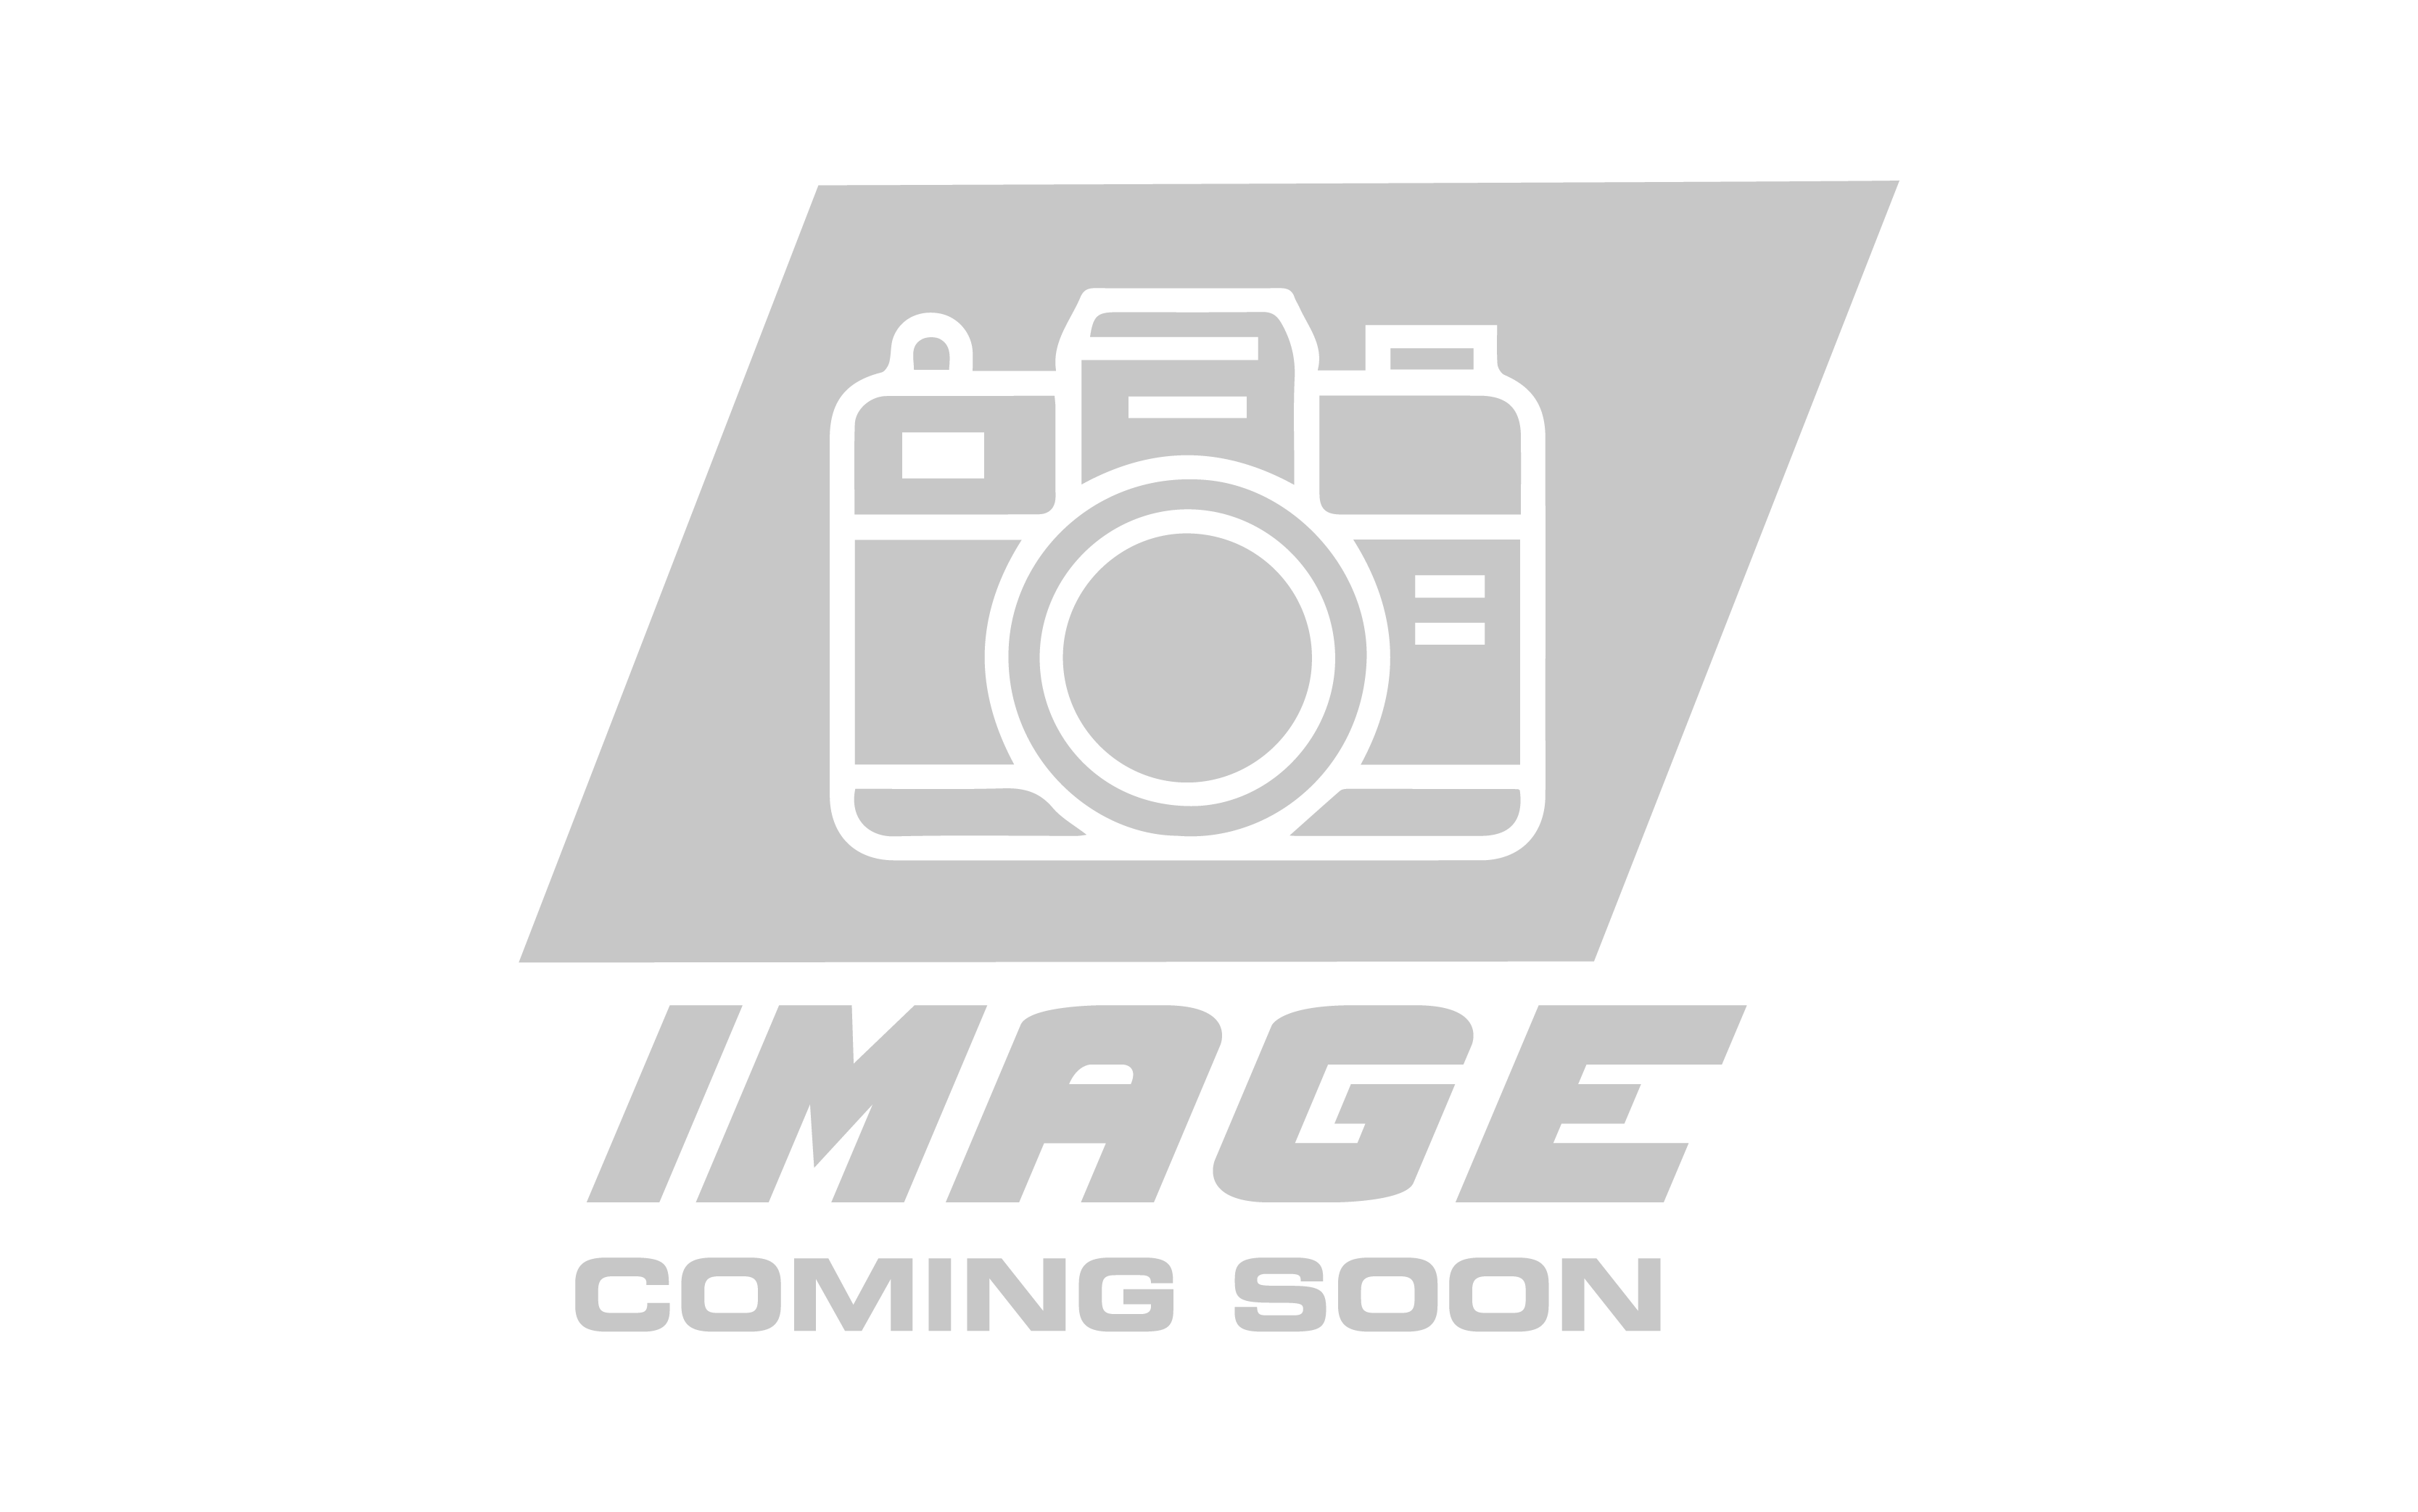 porsche_911_964_air_lift_performance_series_sleeve_style_2